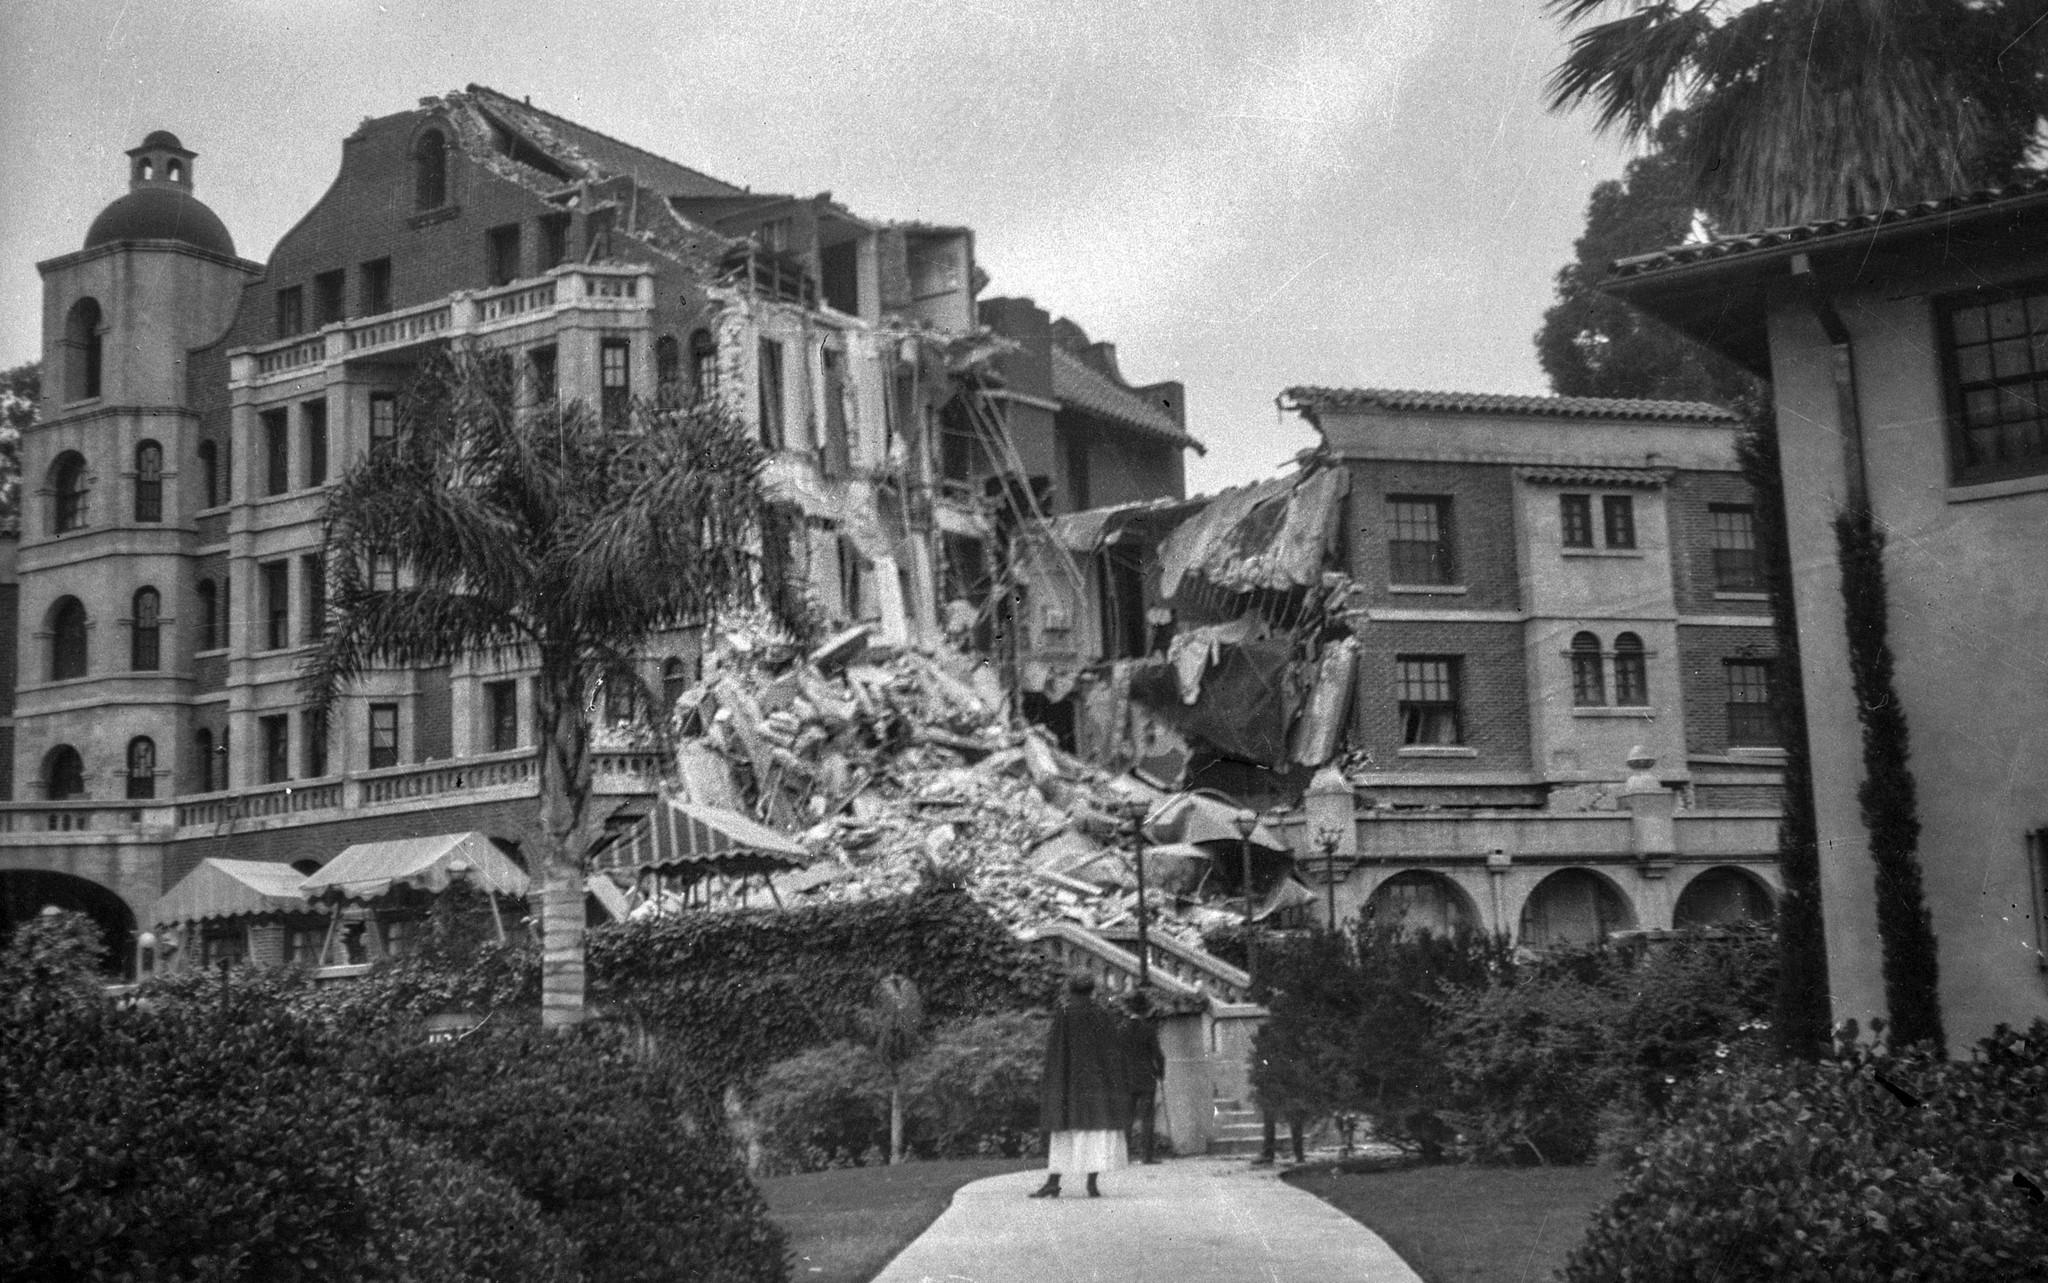 June 1925: Damaged Arlington Hotel following the June 29, 1925 Santa Barbara earthquake. This image